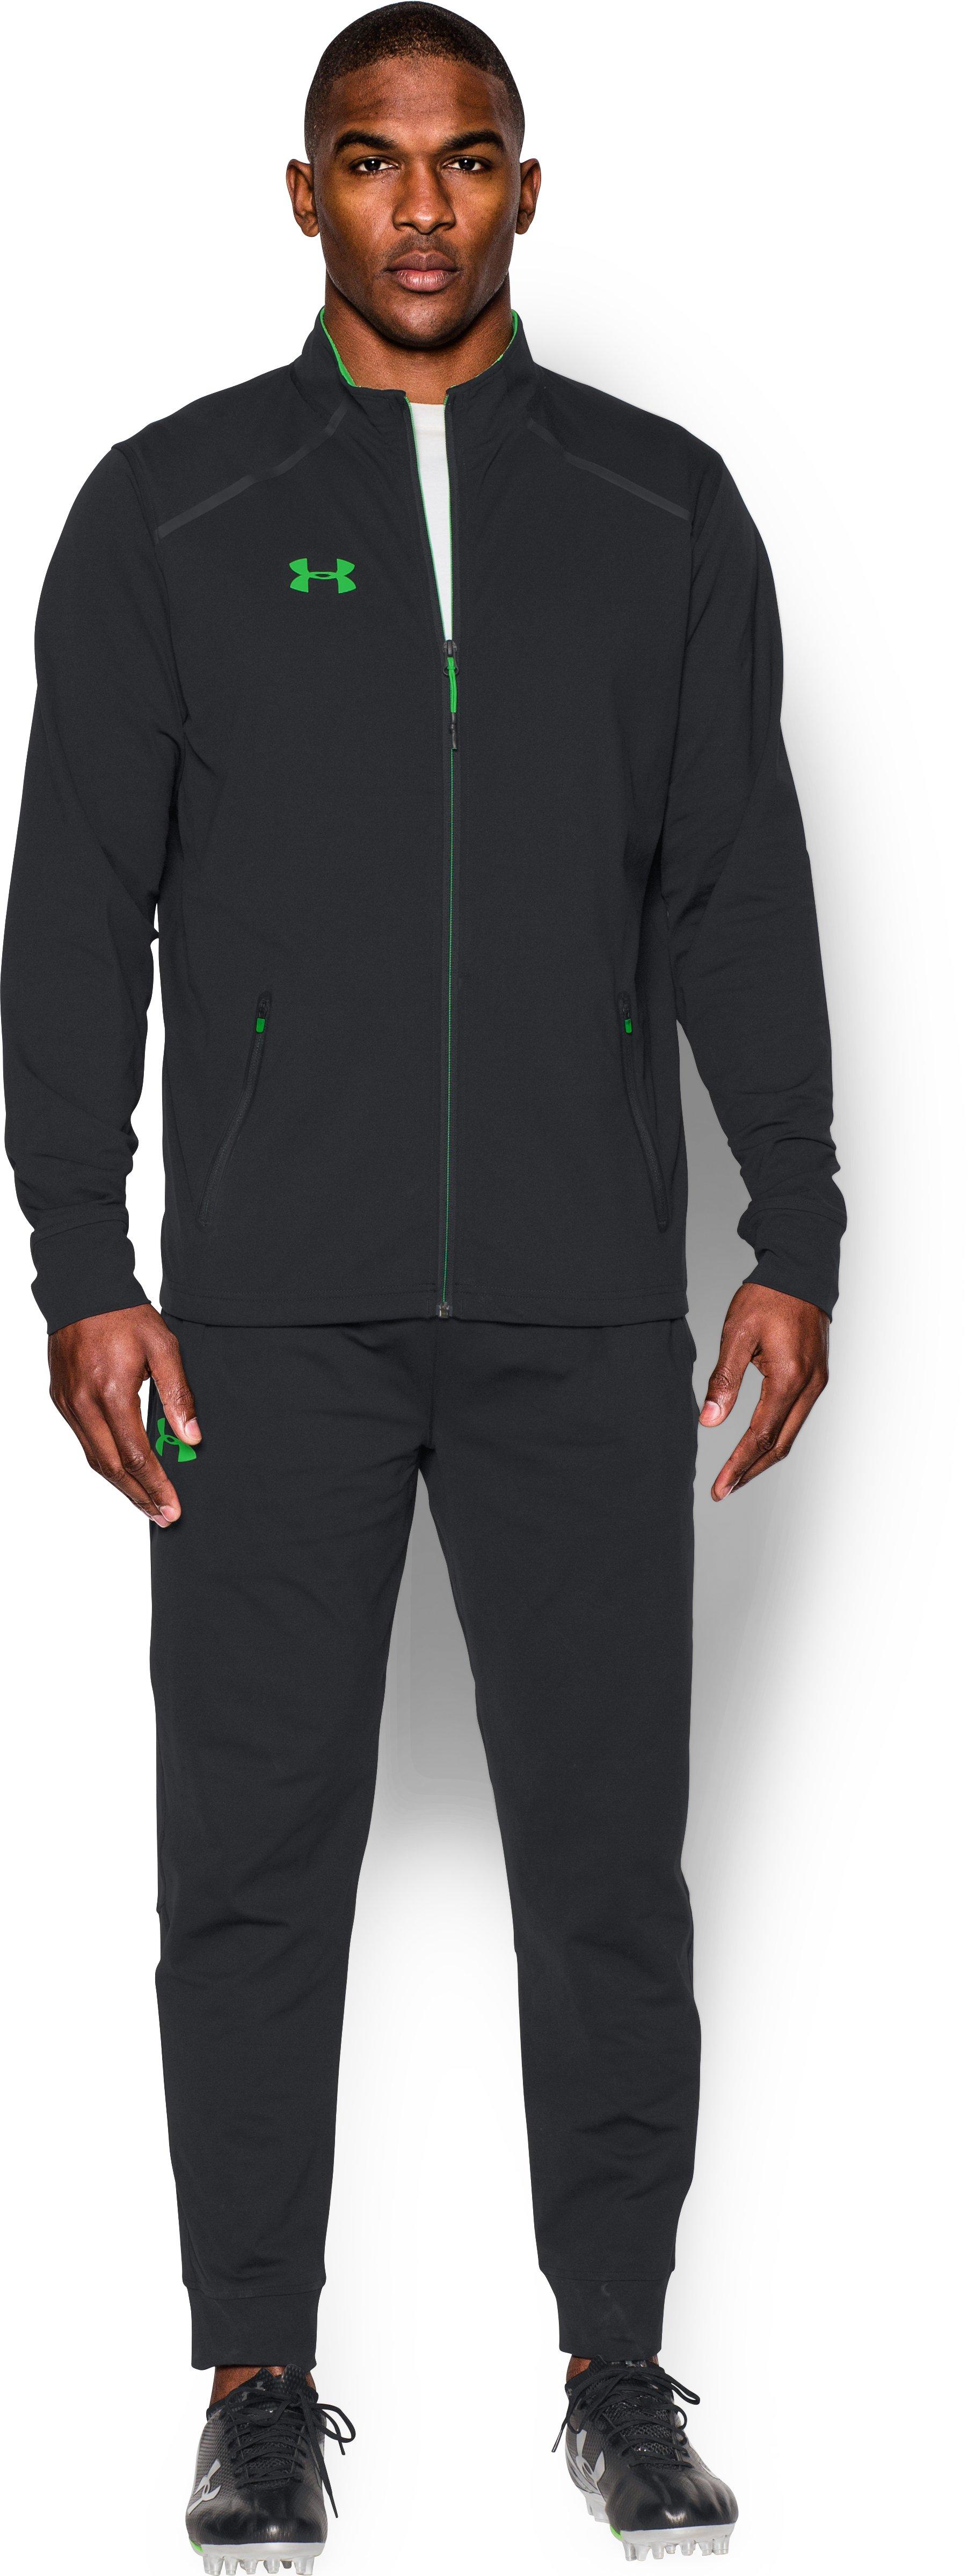 Men's NFL Combine Authentic Warm-Up Jacket